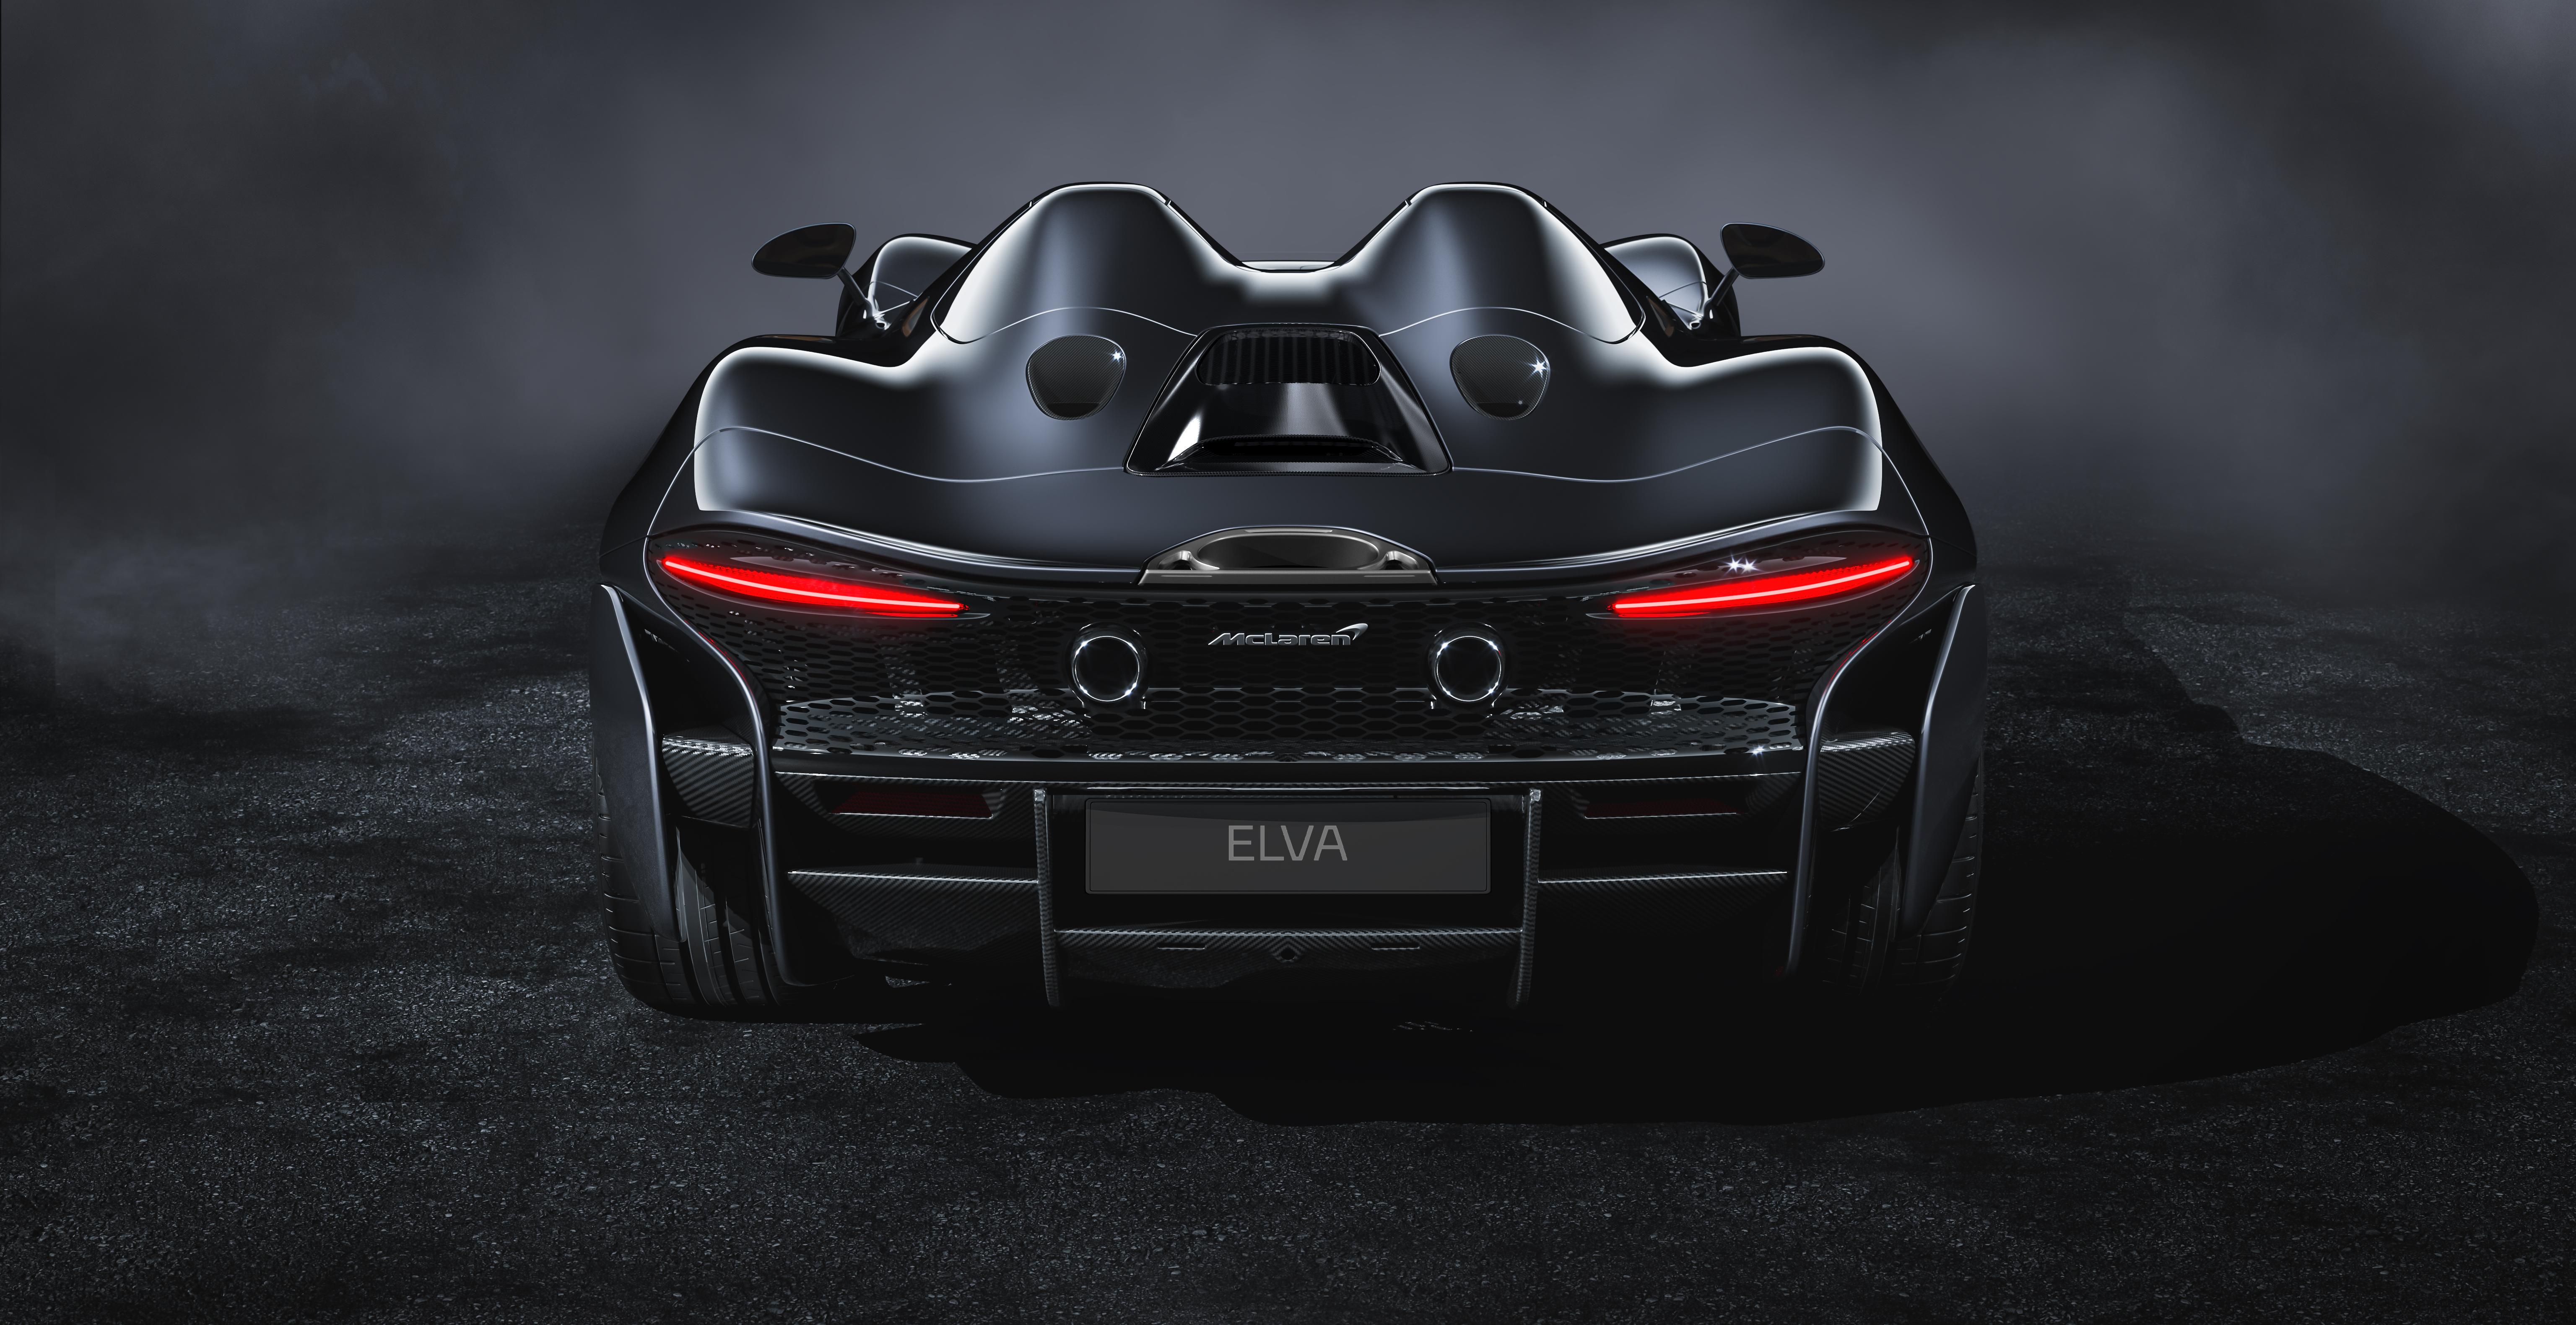 2020 mclaren elva 1577652473 - 2020 McLaren Elva - 2020 McLaren Elva 4k wallpaper